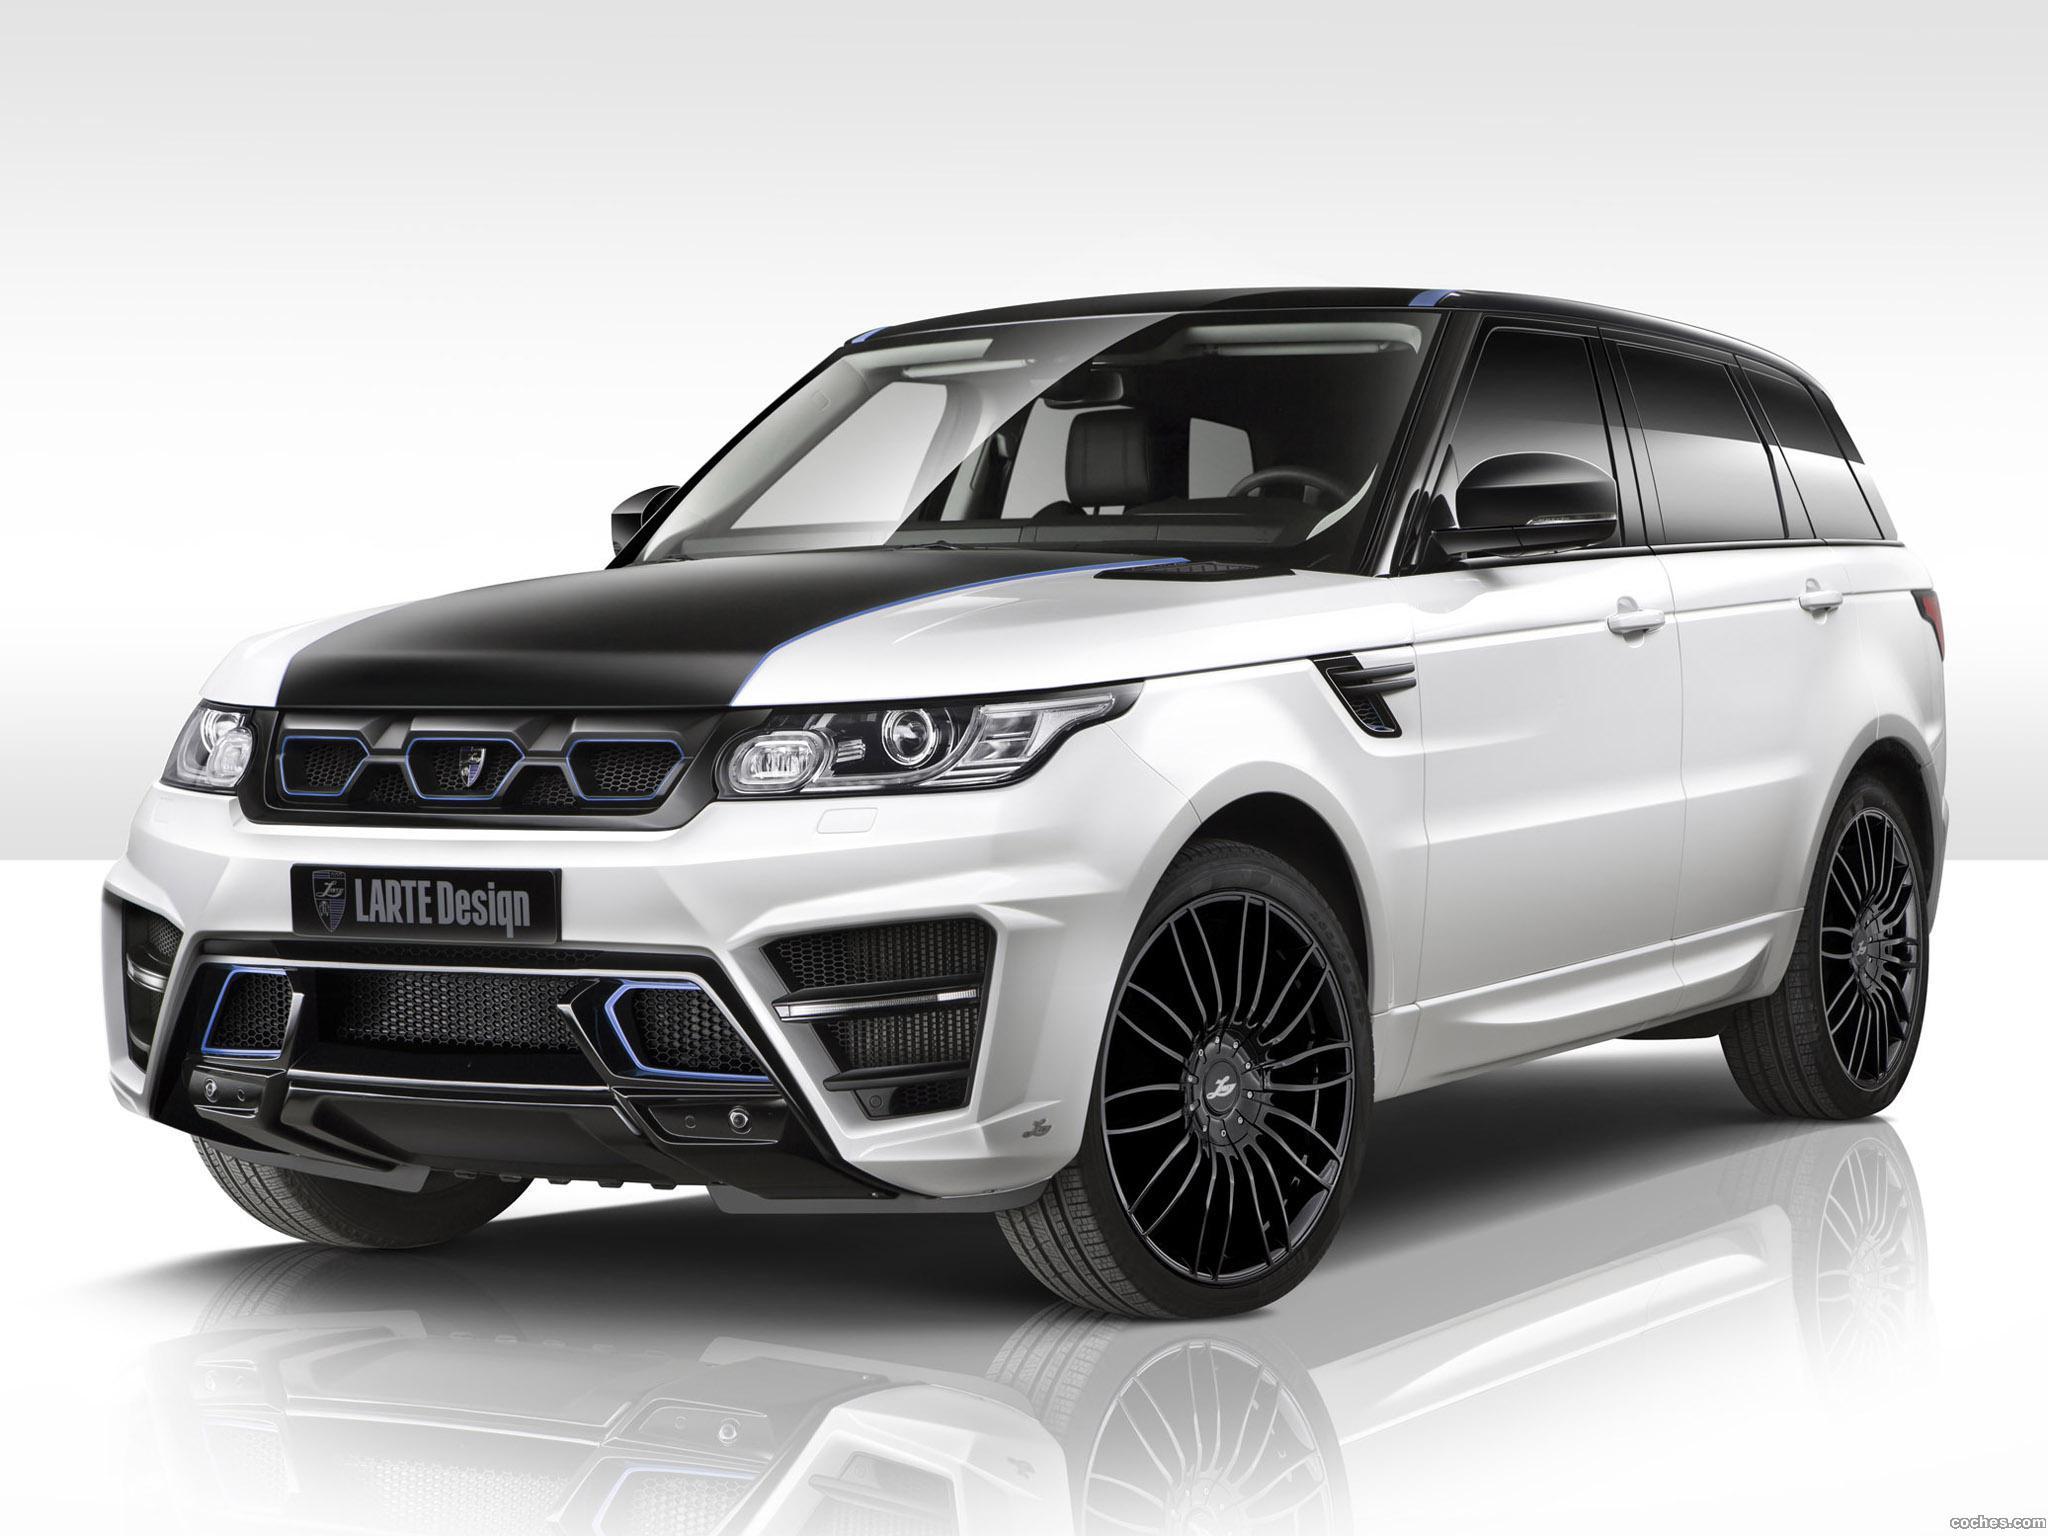 Foto 4 de Larte Design Range Rover Sport Winner 2014